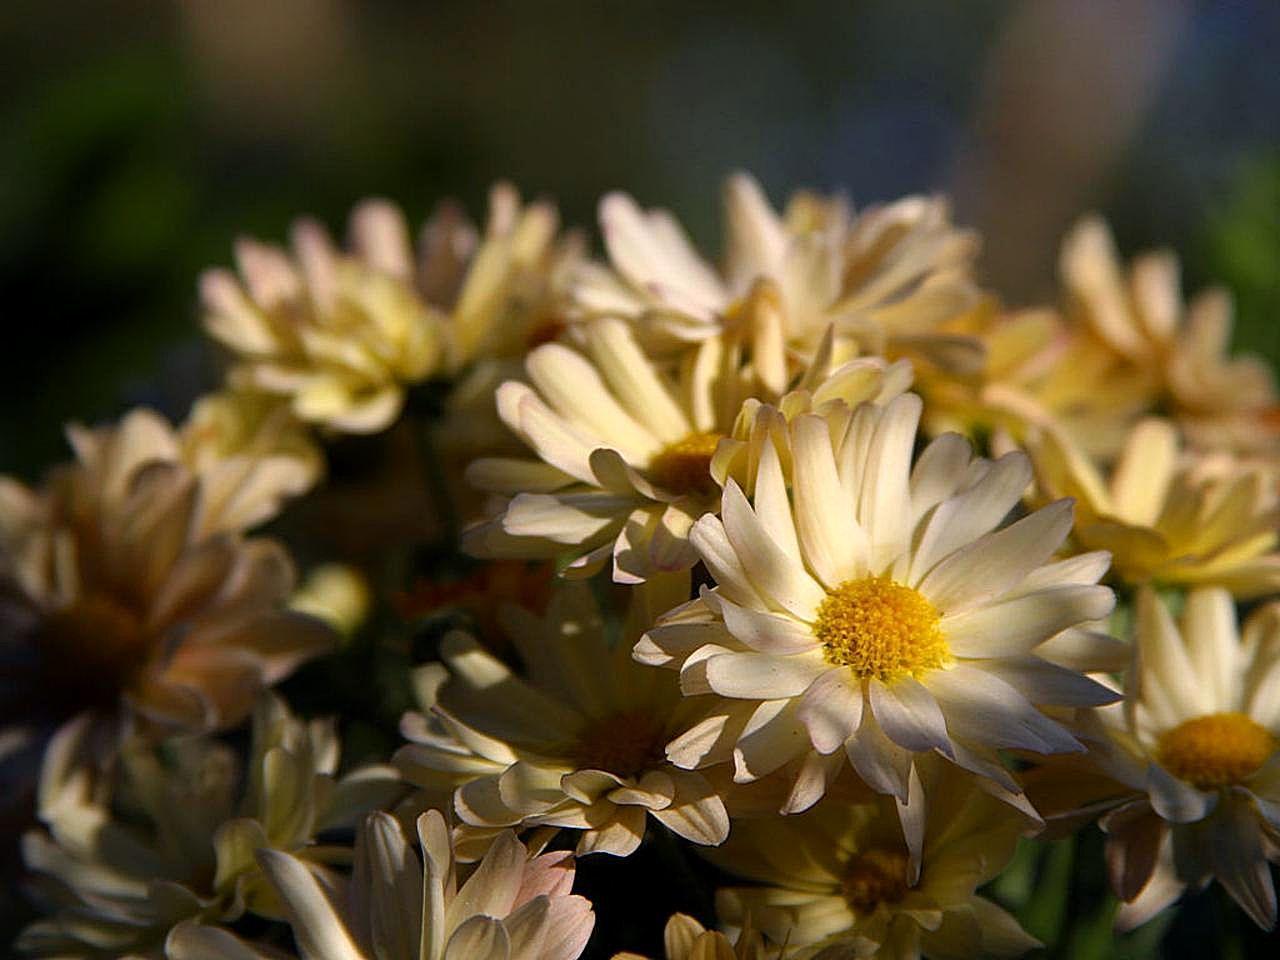 Free picture daisy daisies flowers daisy daisies flowers izmirmasajfo Choice Image